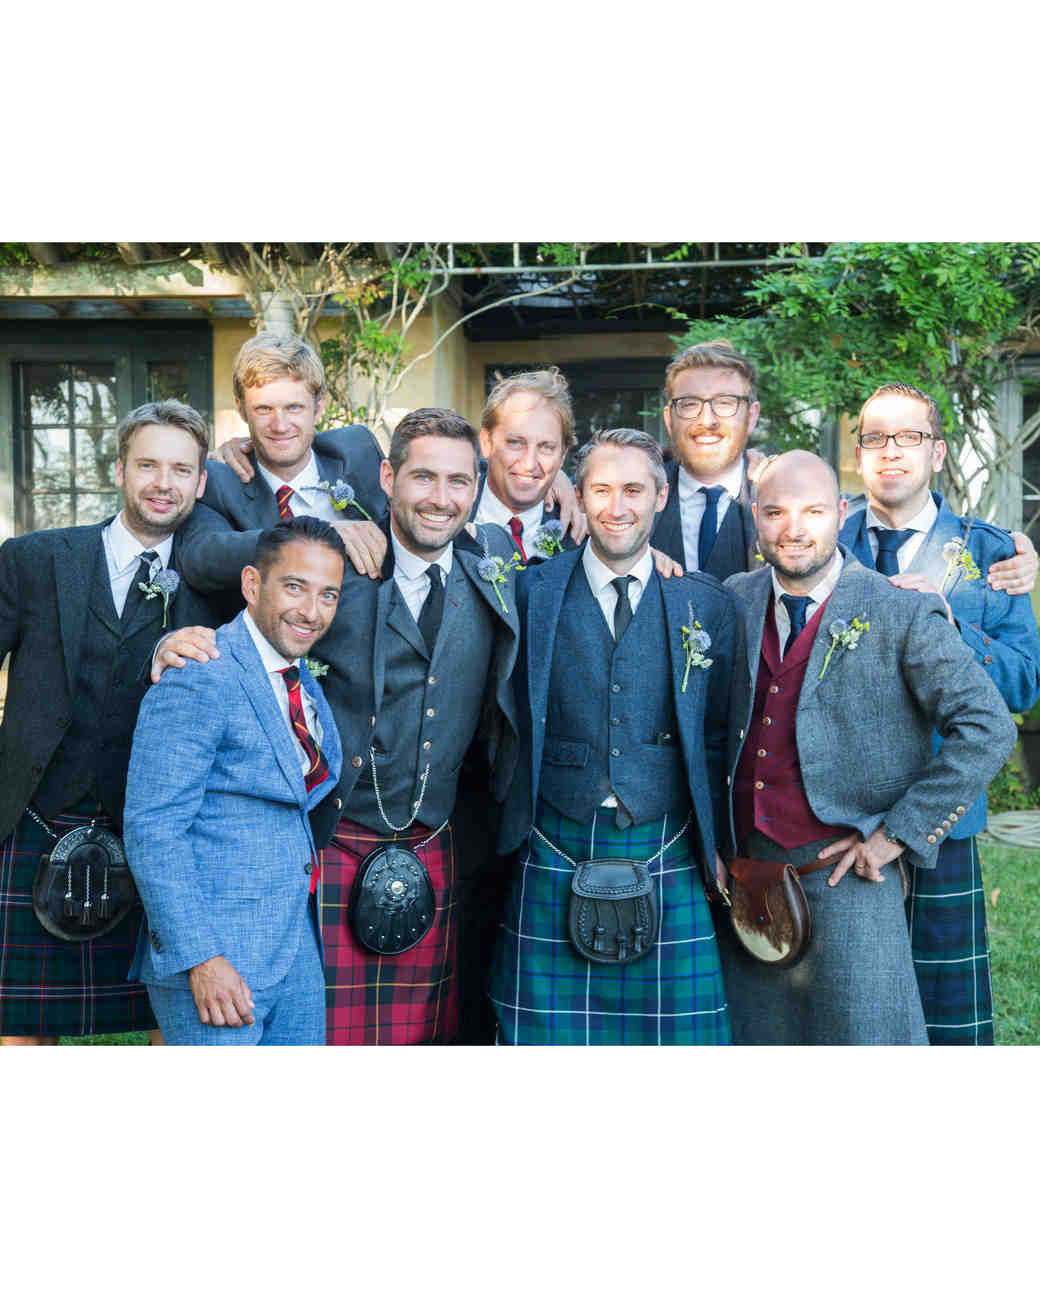 wedding groomsmen kilts